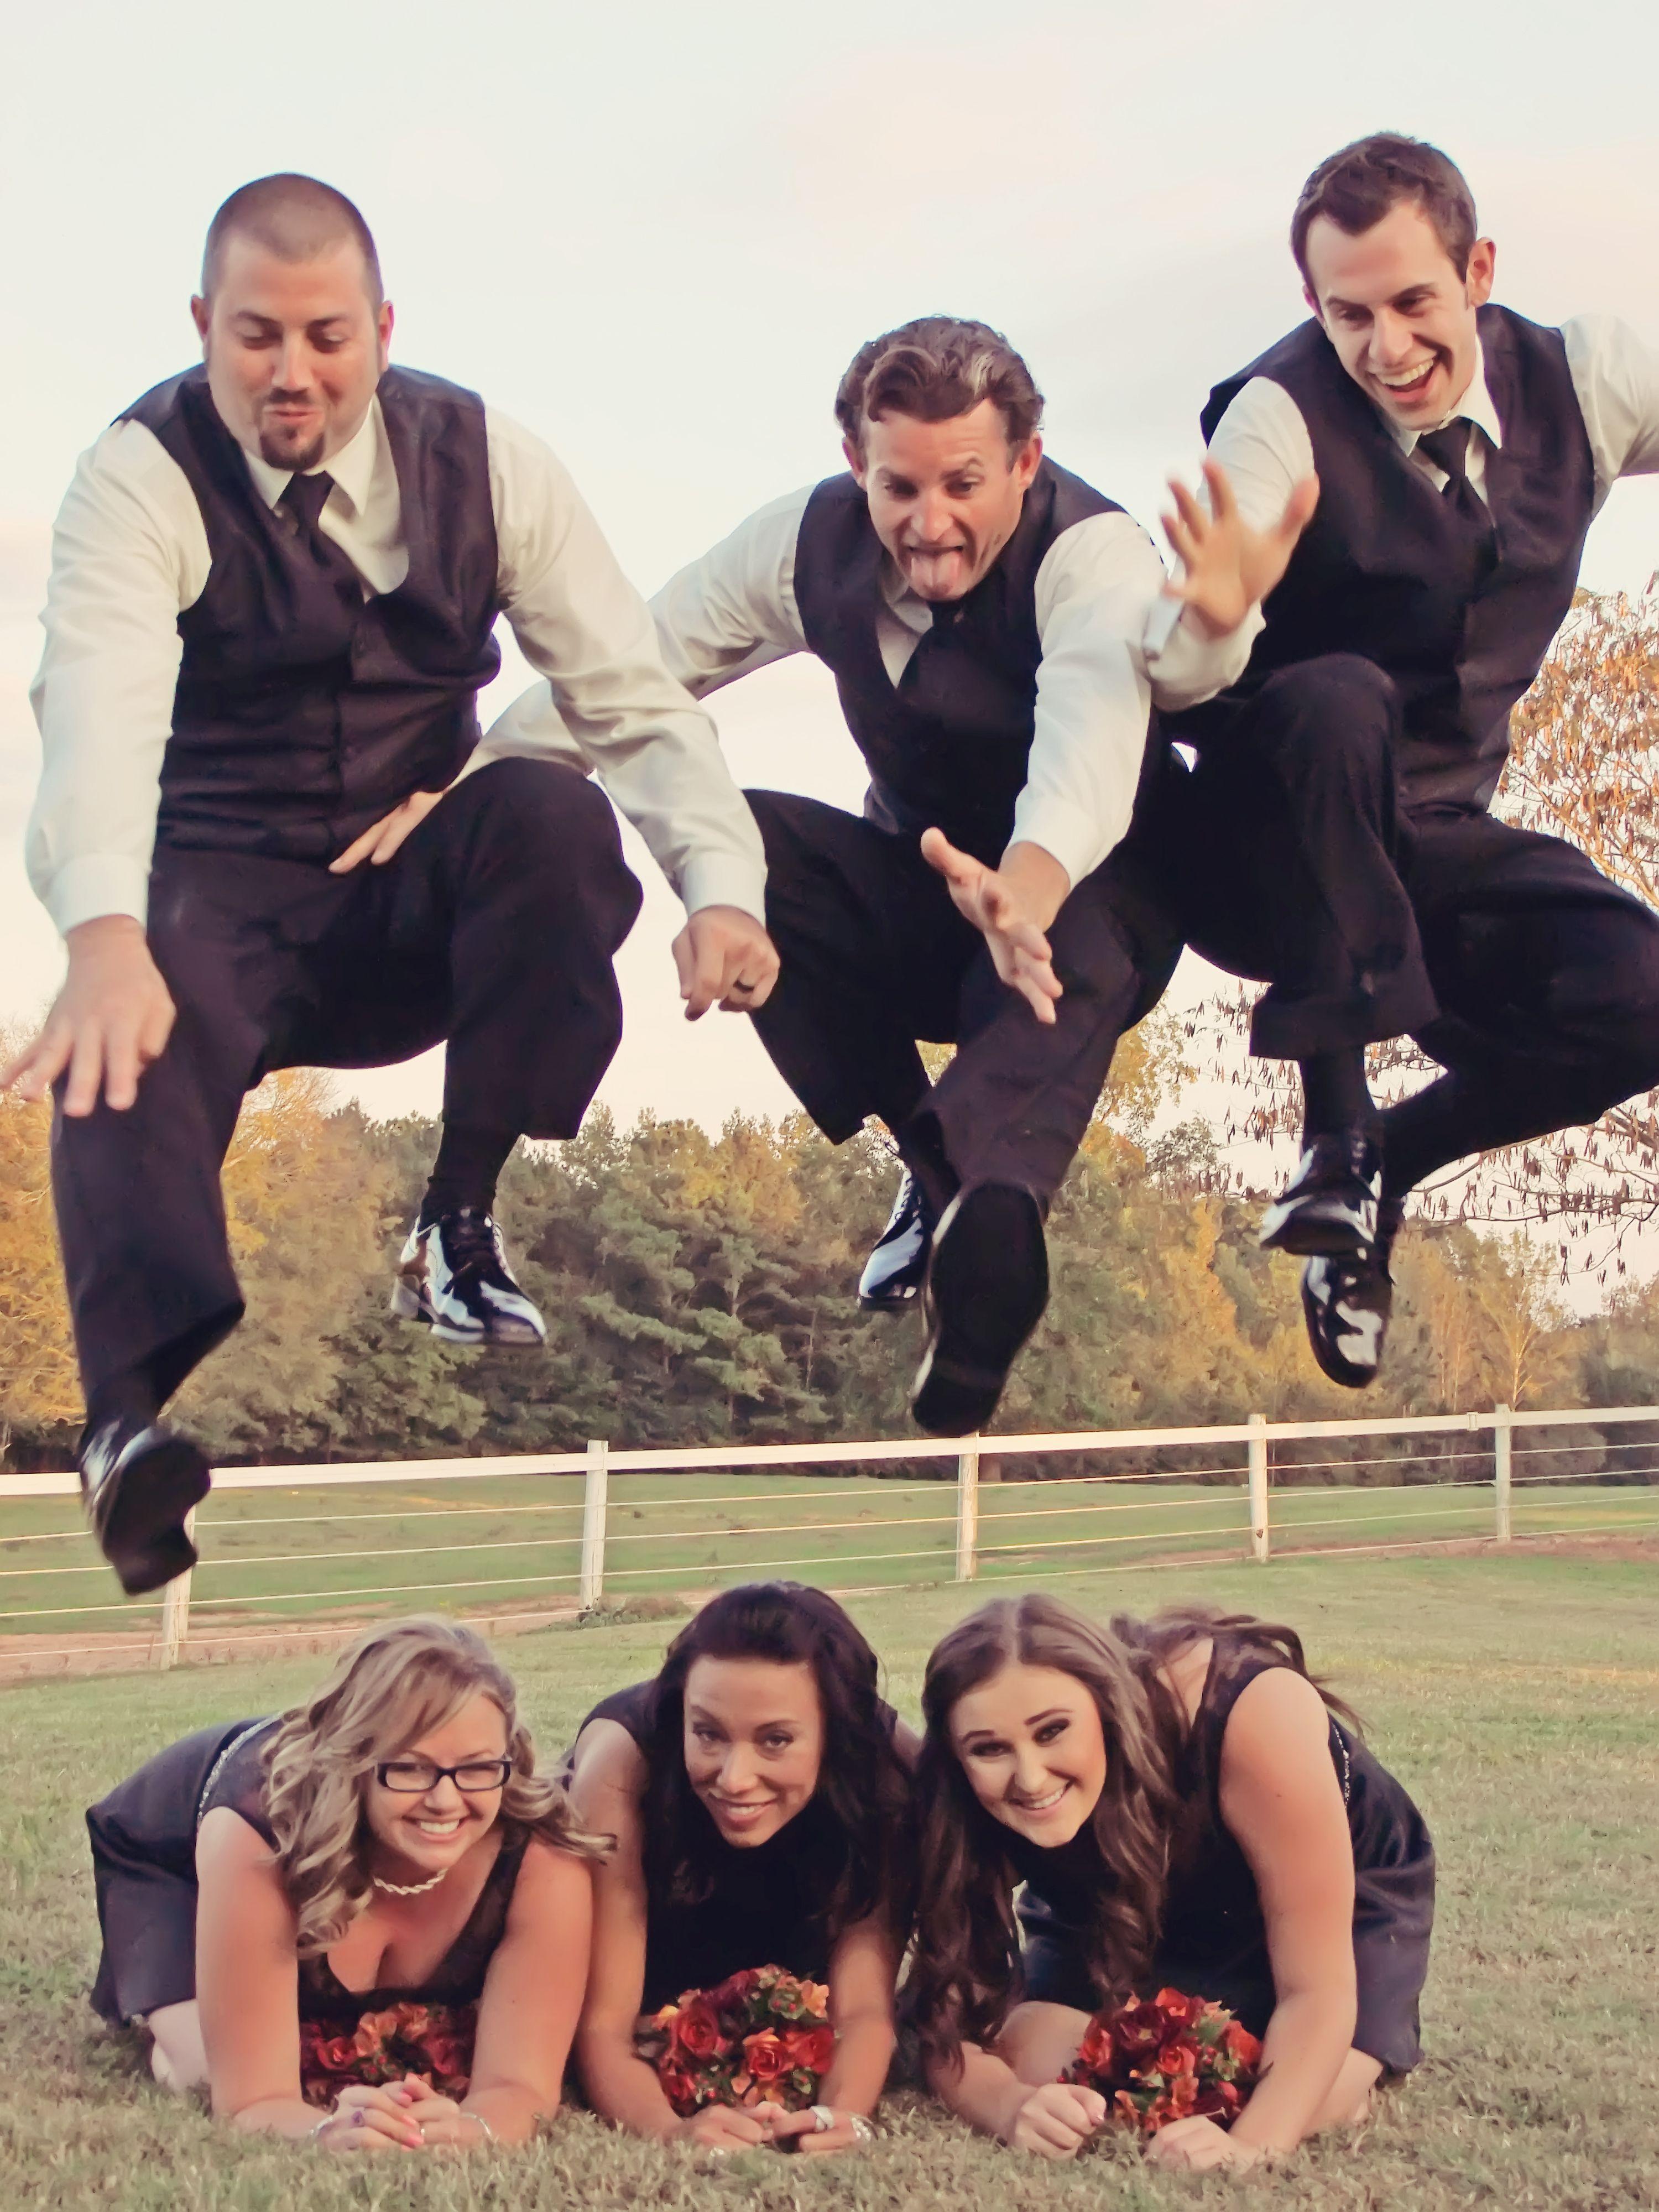 Groomsmen jumping over the bridesmaids! WWW.FOTABULOUSWEDDINGS.COM